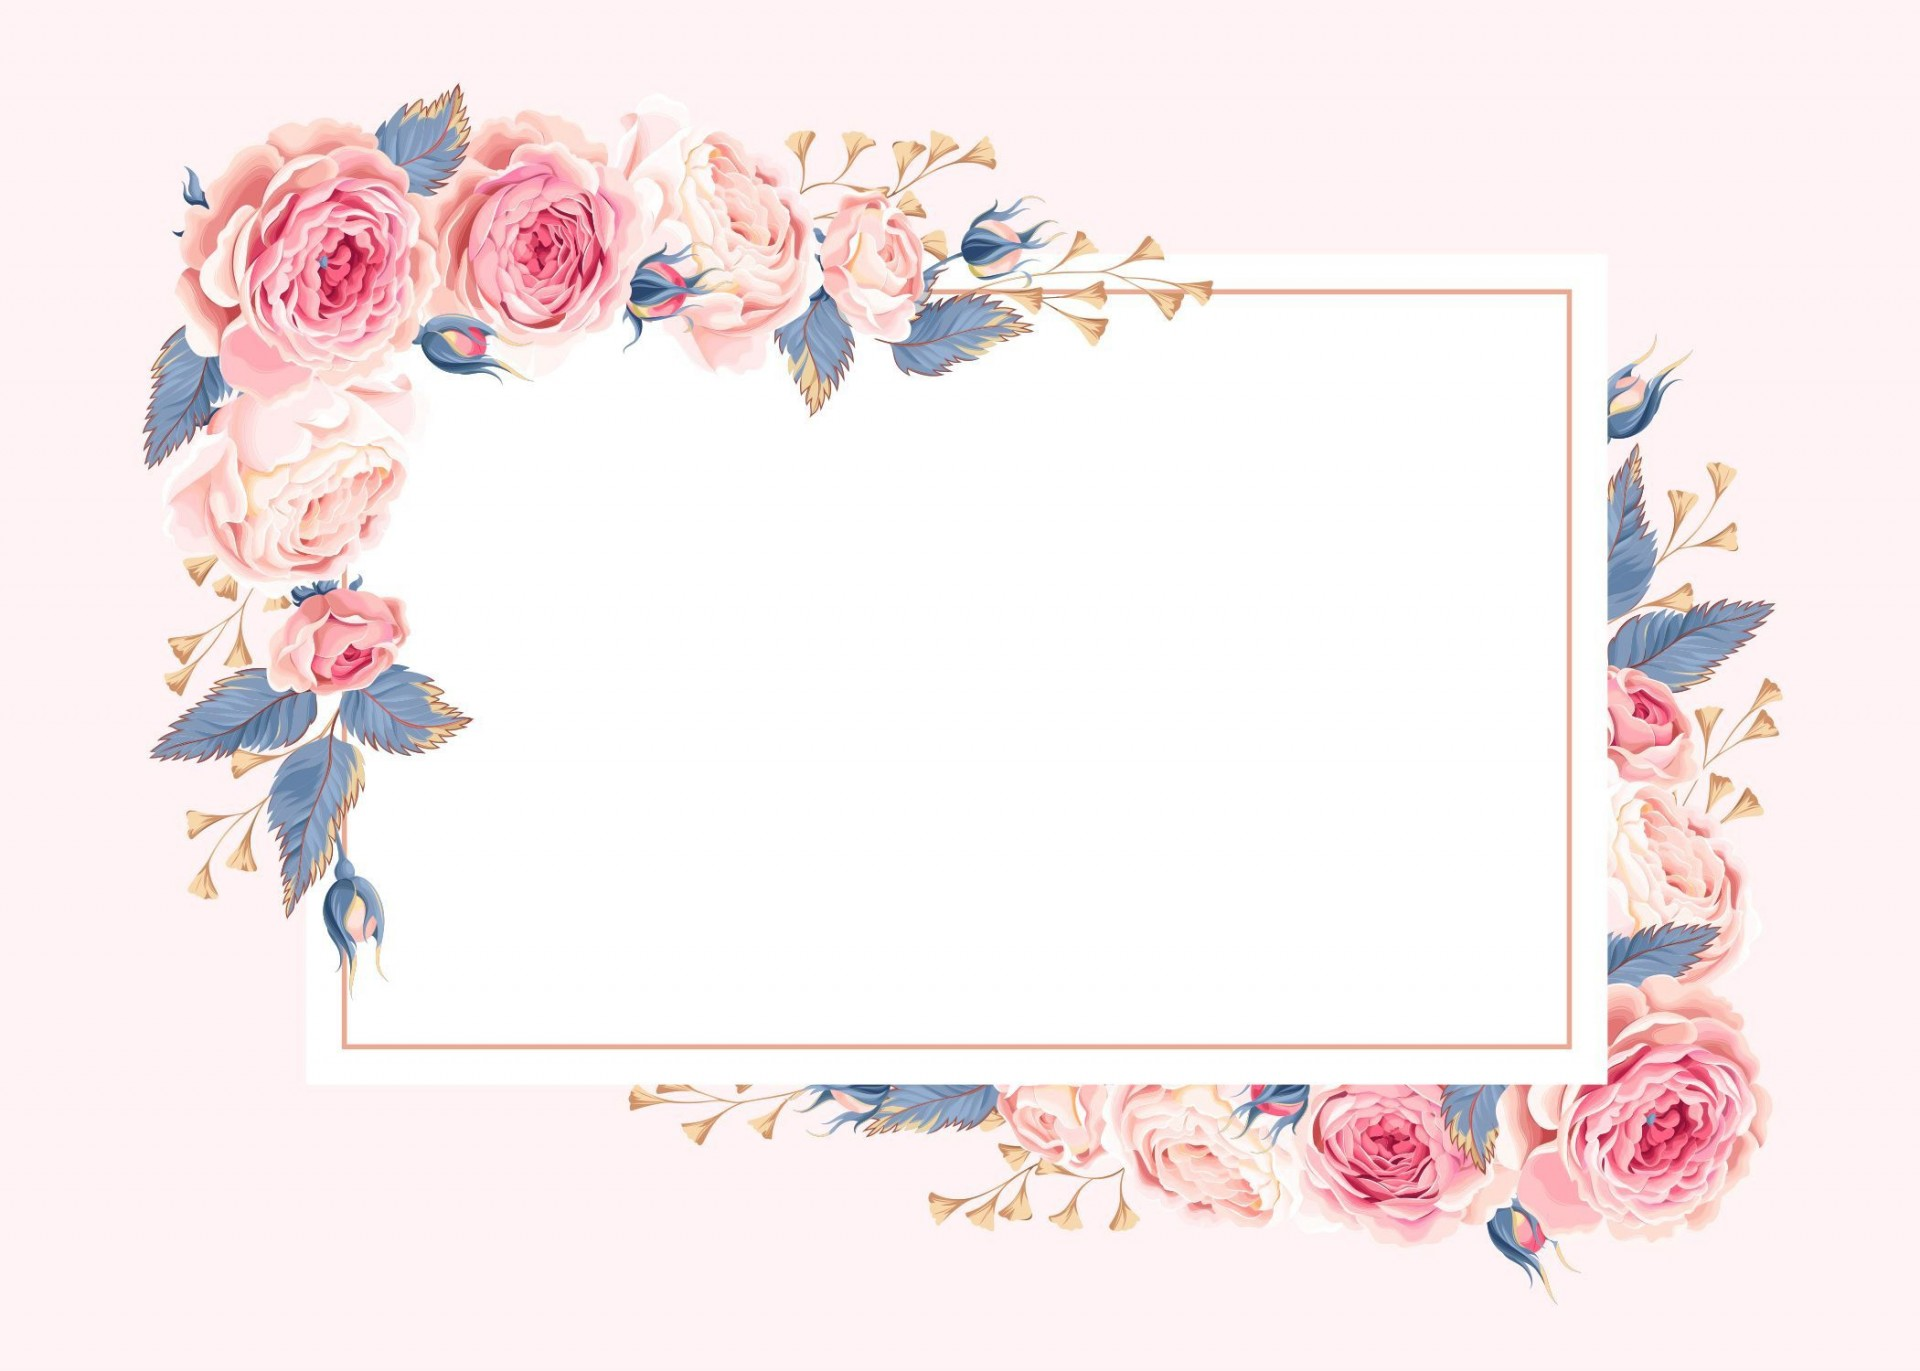 005 Breathtaking Printable Greeting Card Template Design  Templates Print Free Birthday1920